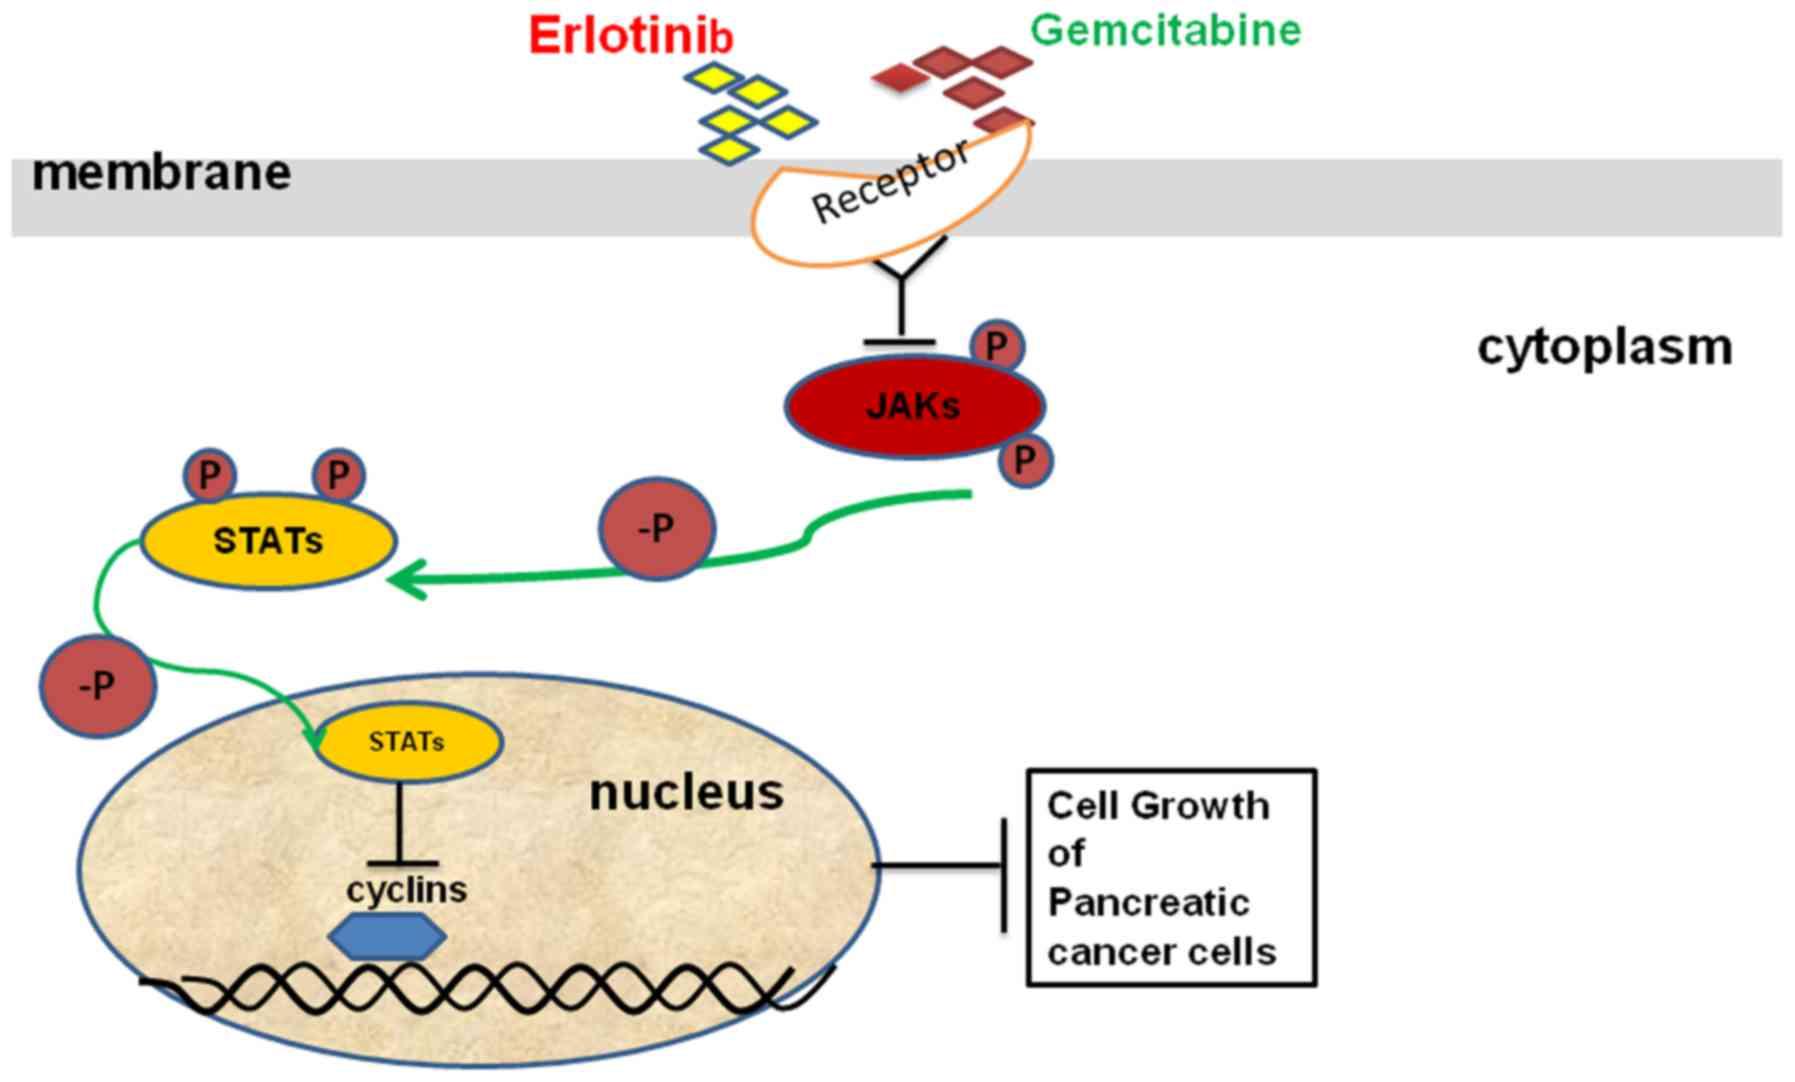 pancreatic cancer erlotinib)